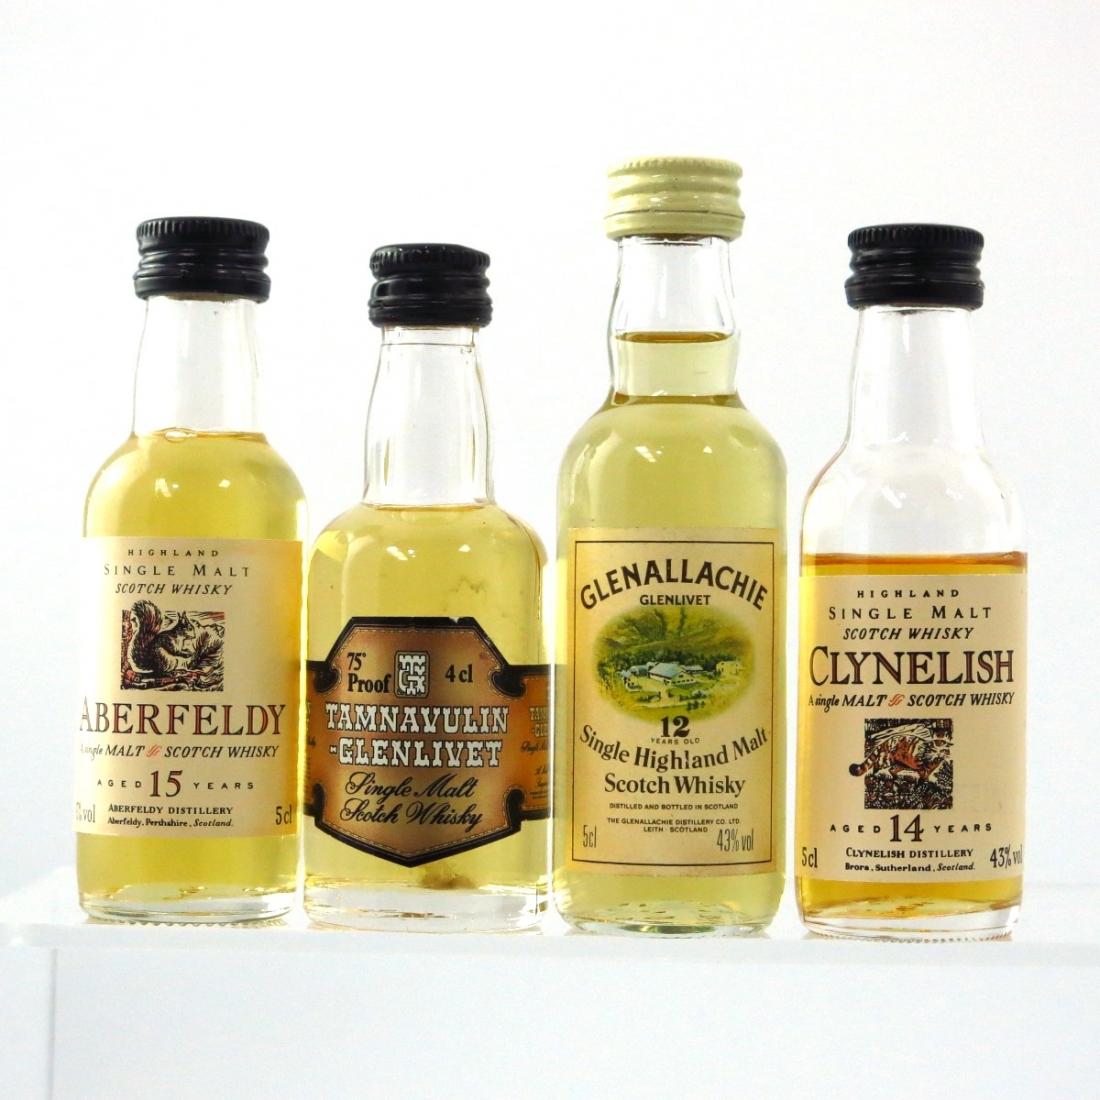 Single Malt Miniatures x 4 / includes Glenallachie 12 Year Old